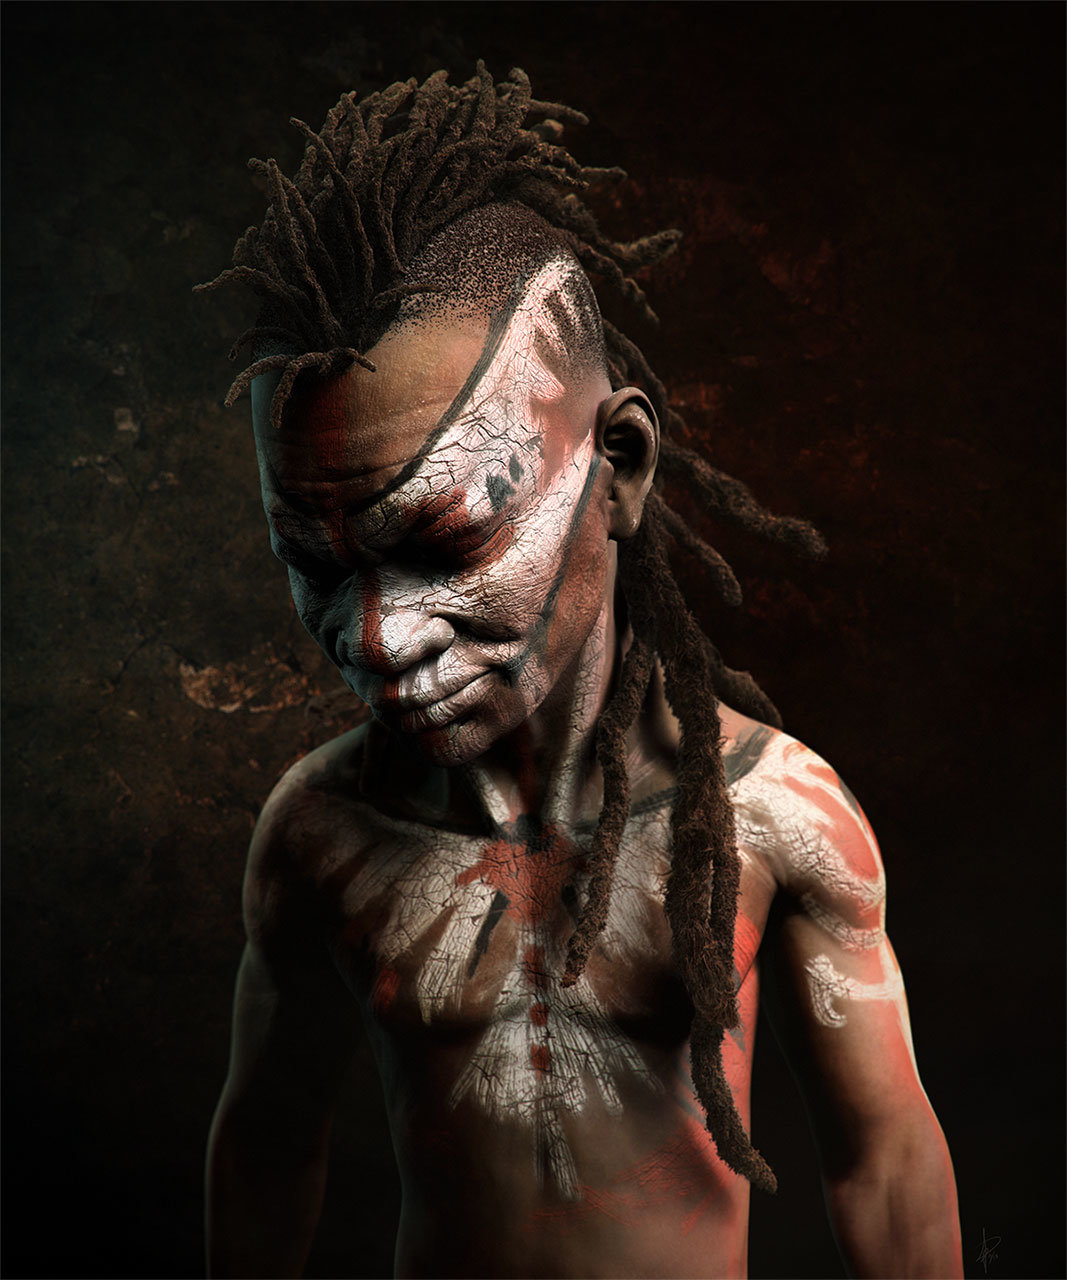 Pablo munoz gomez dreadlocks warrior colour